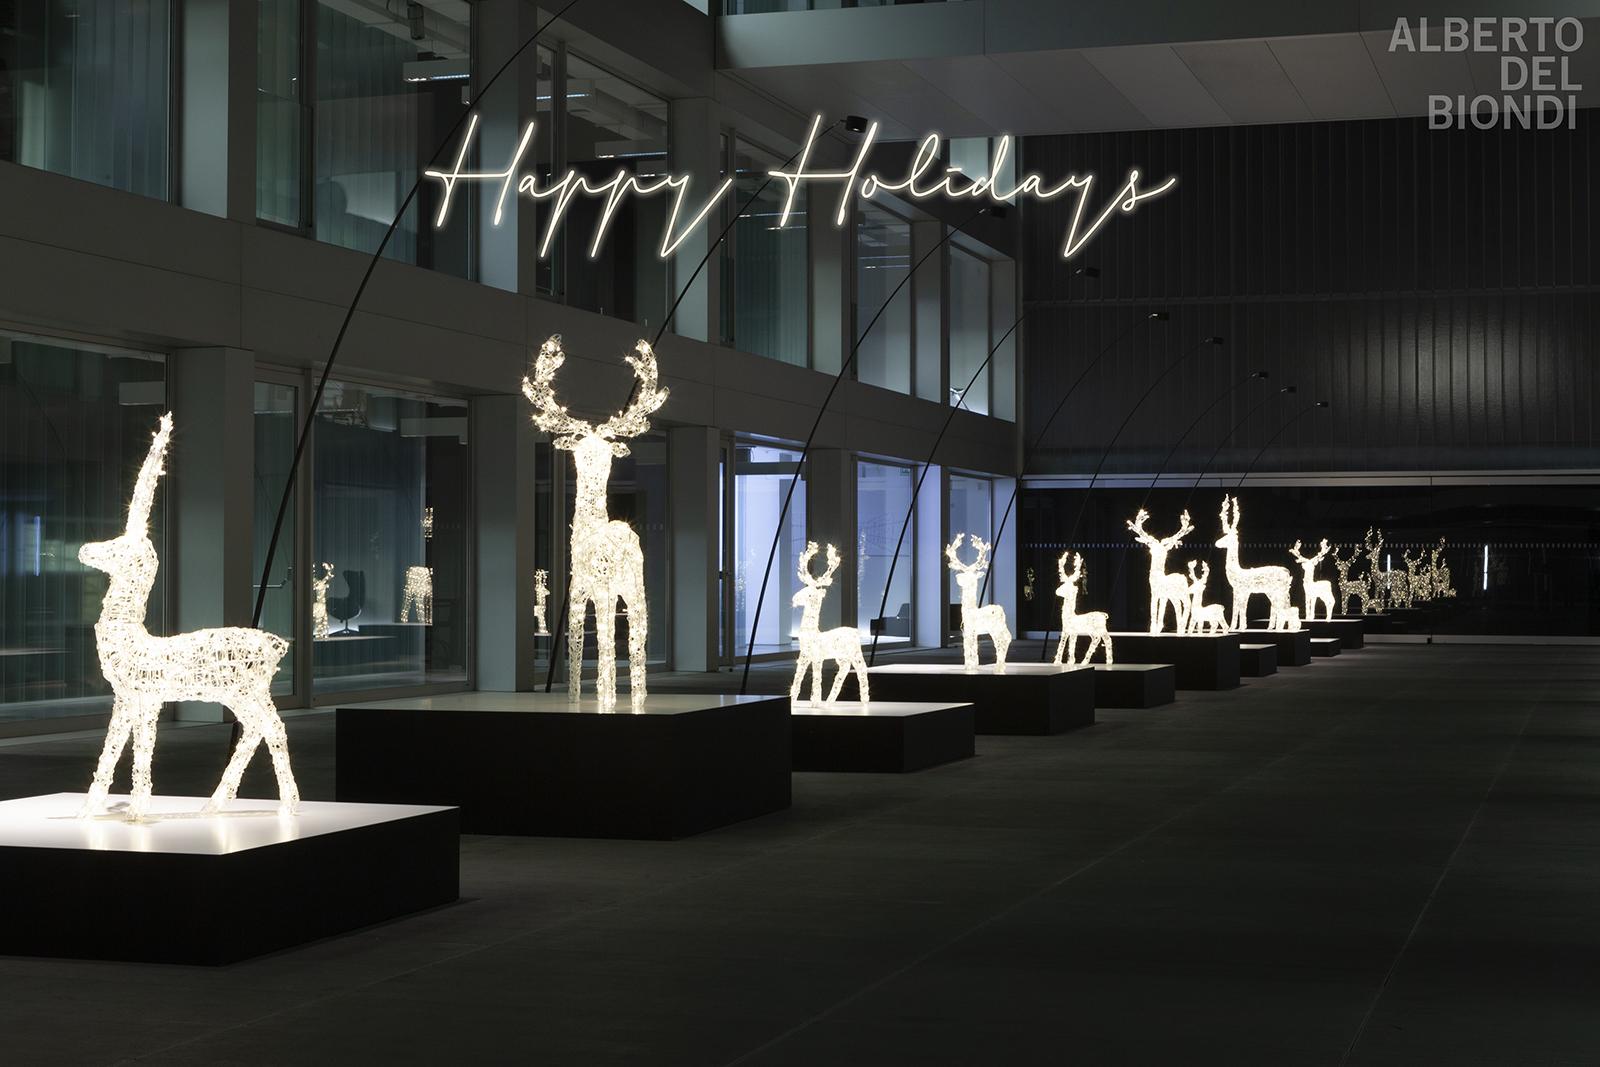 ADB-Happy-Holidays-2020-01